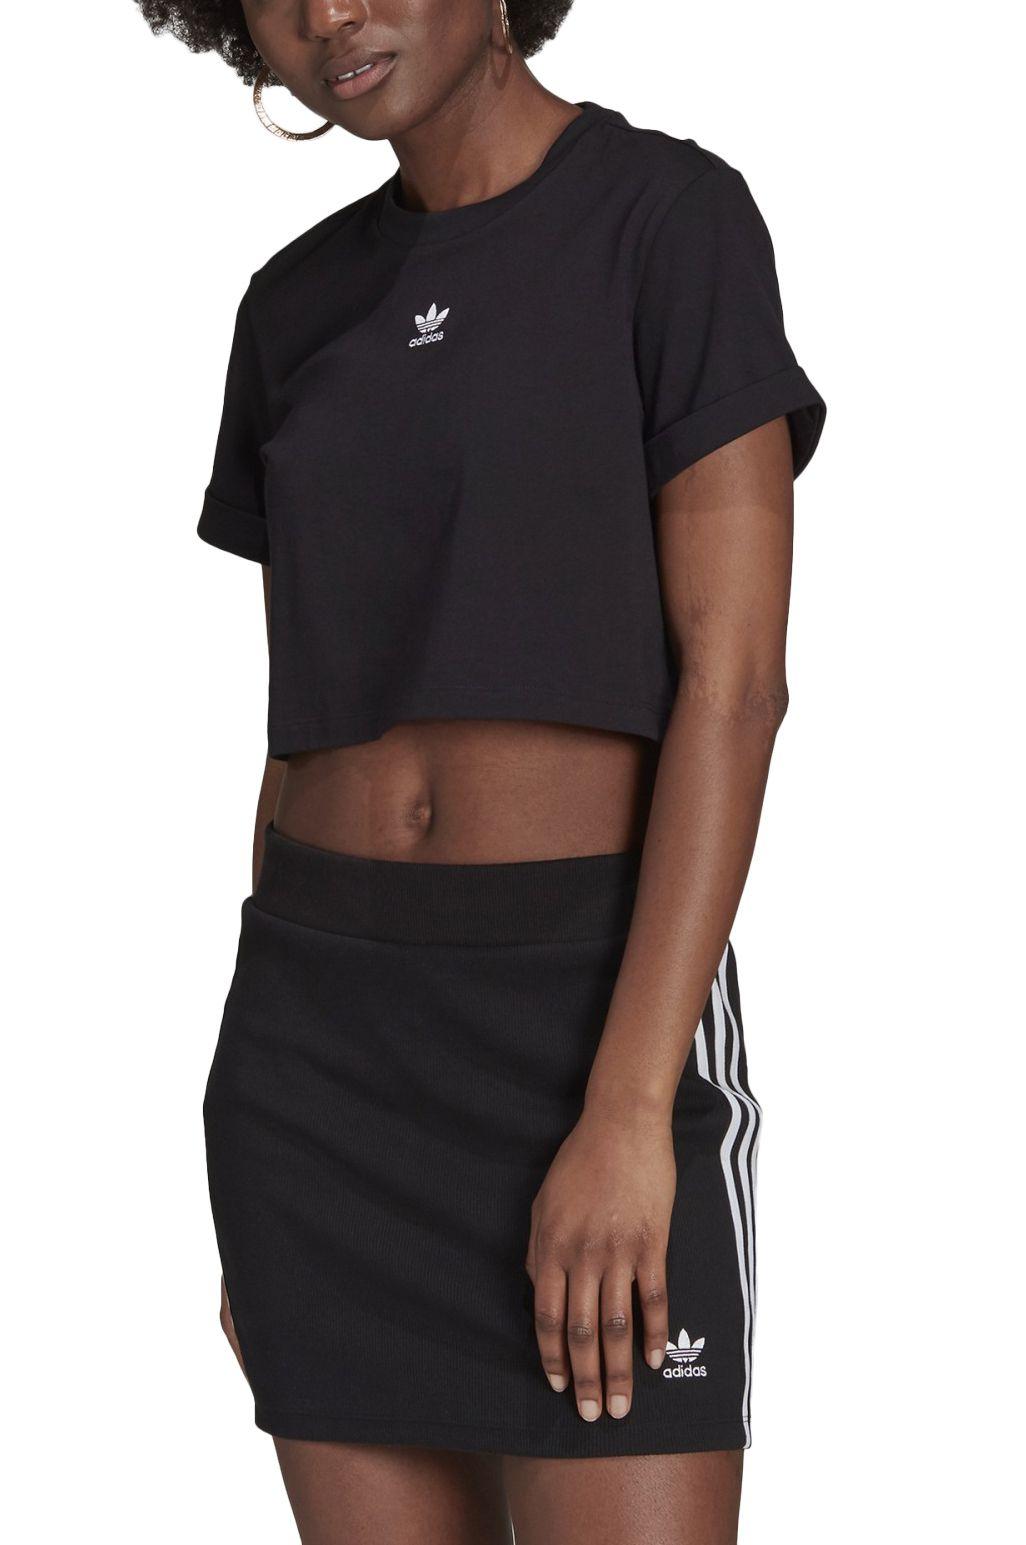 Adidas Top TEE Black